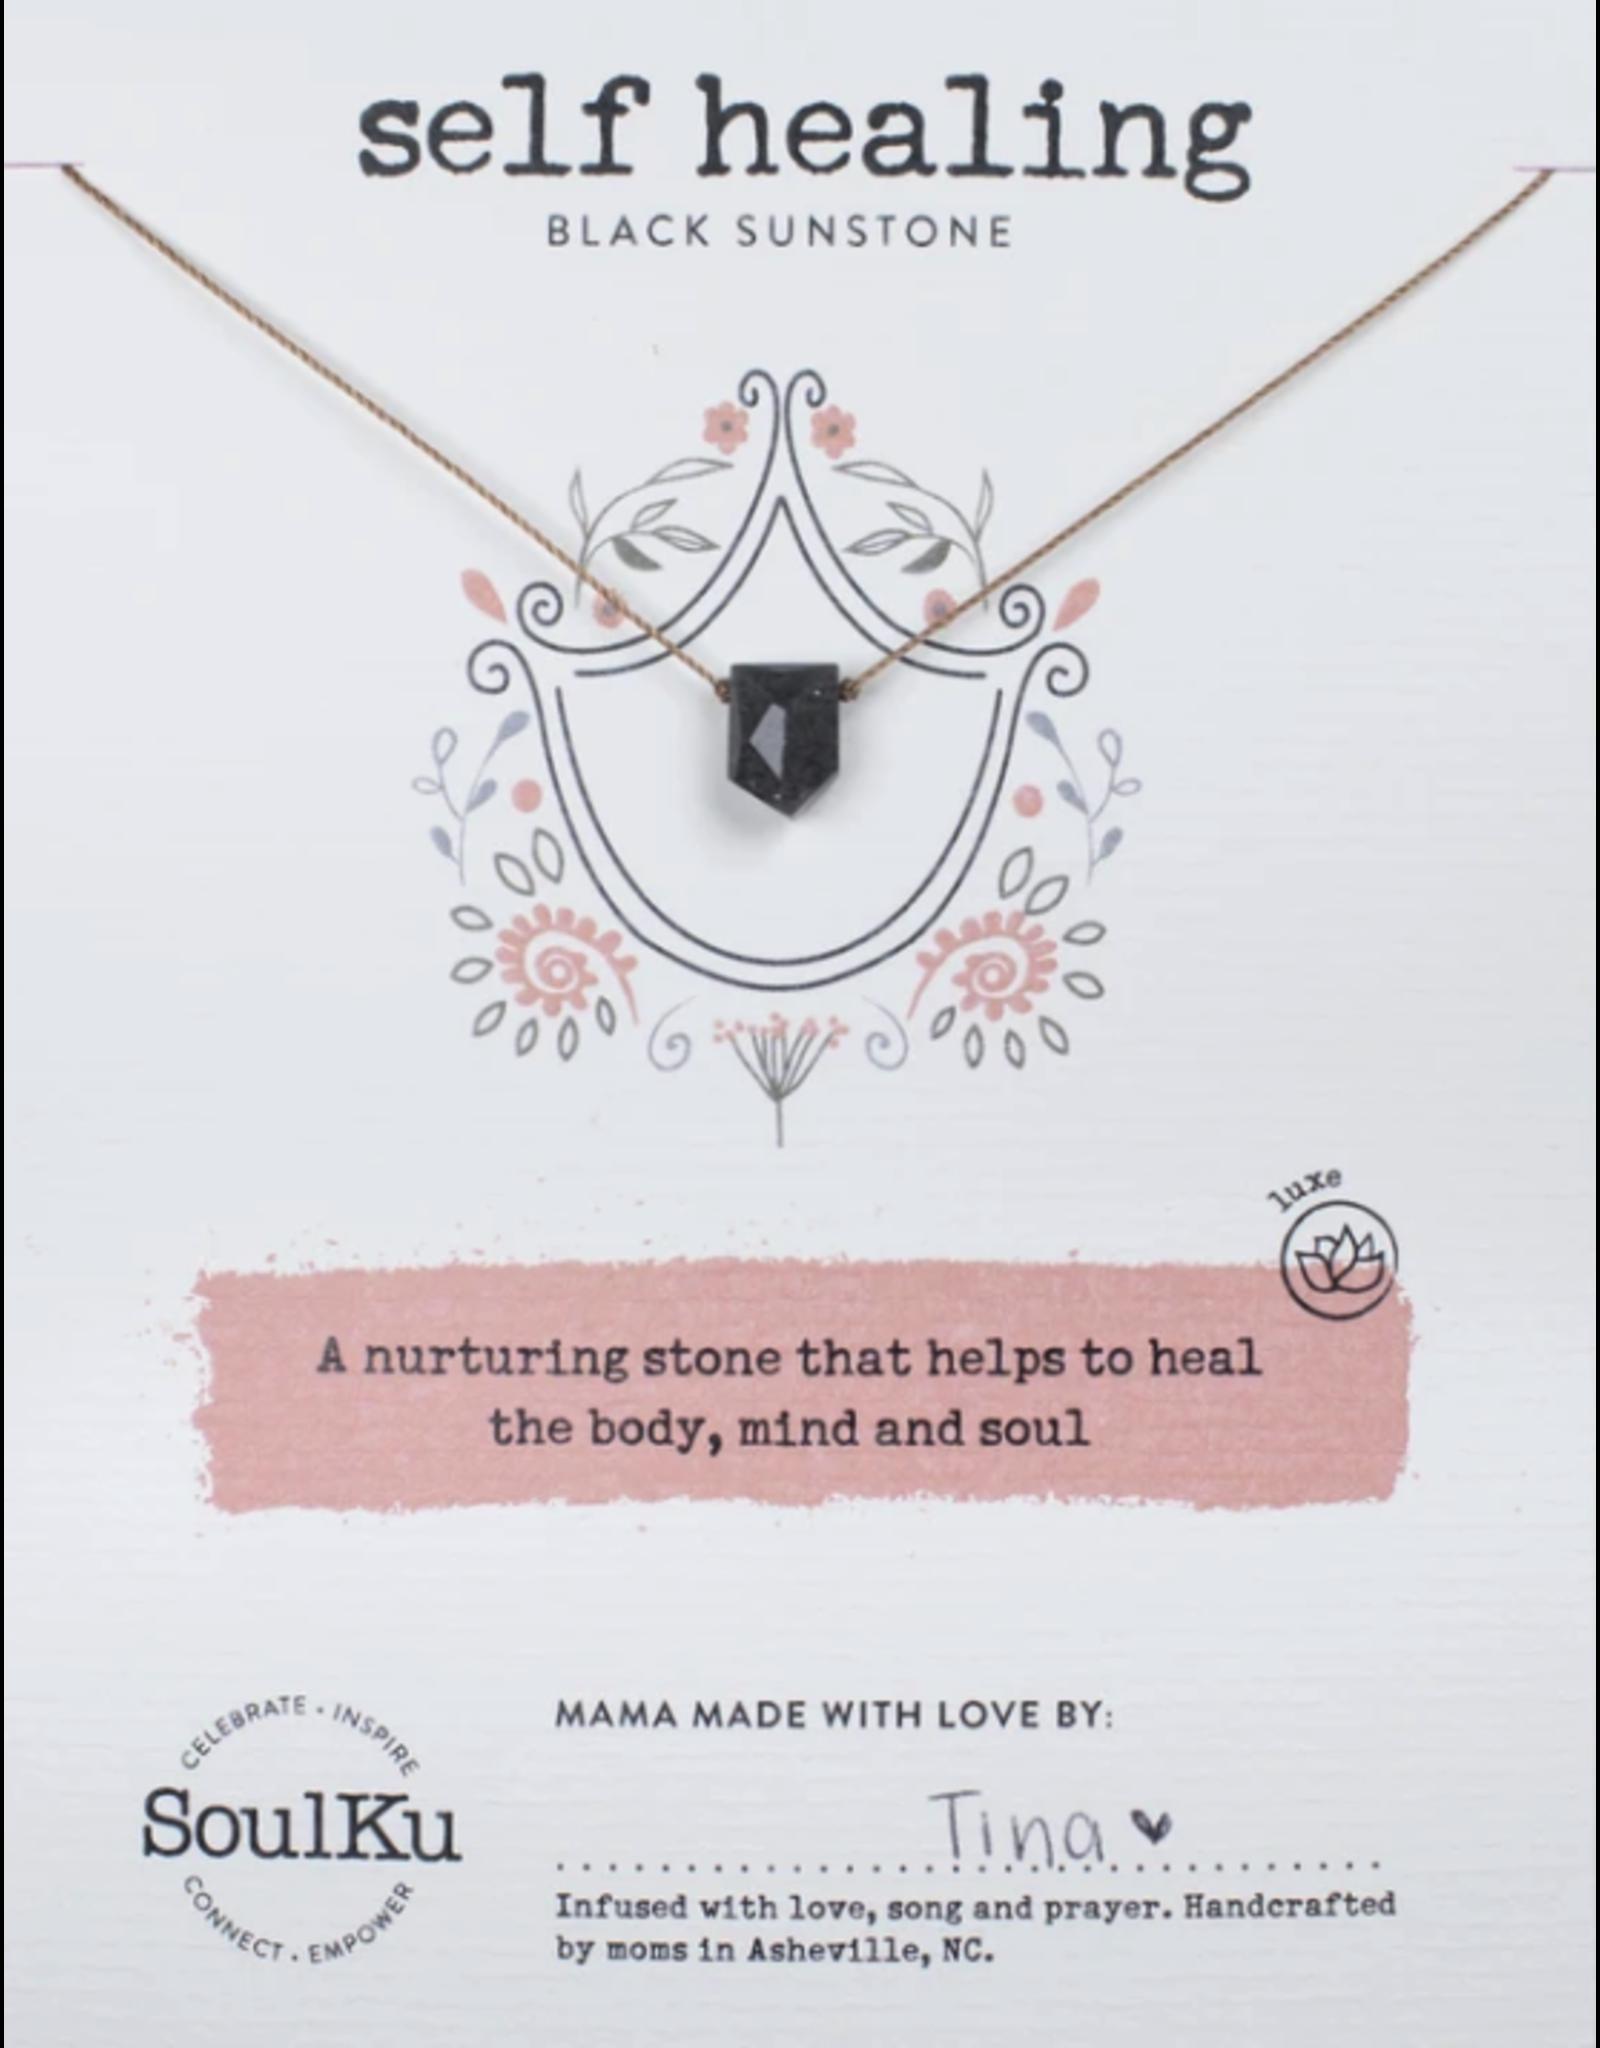 Black Sunstone Warrior Stone - Self Healing